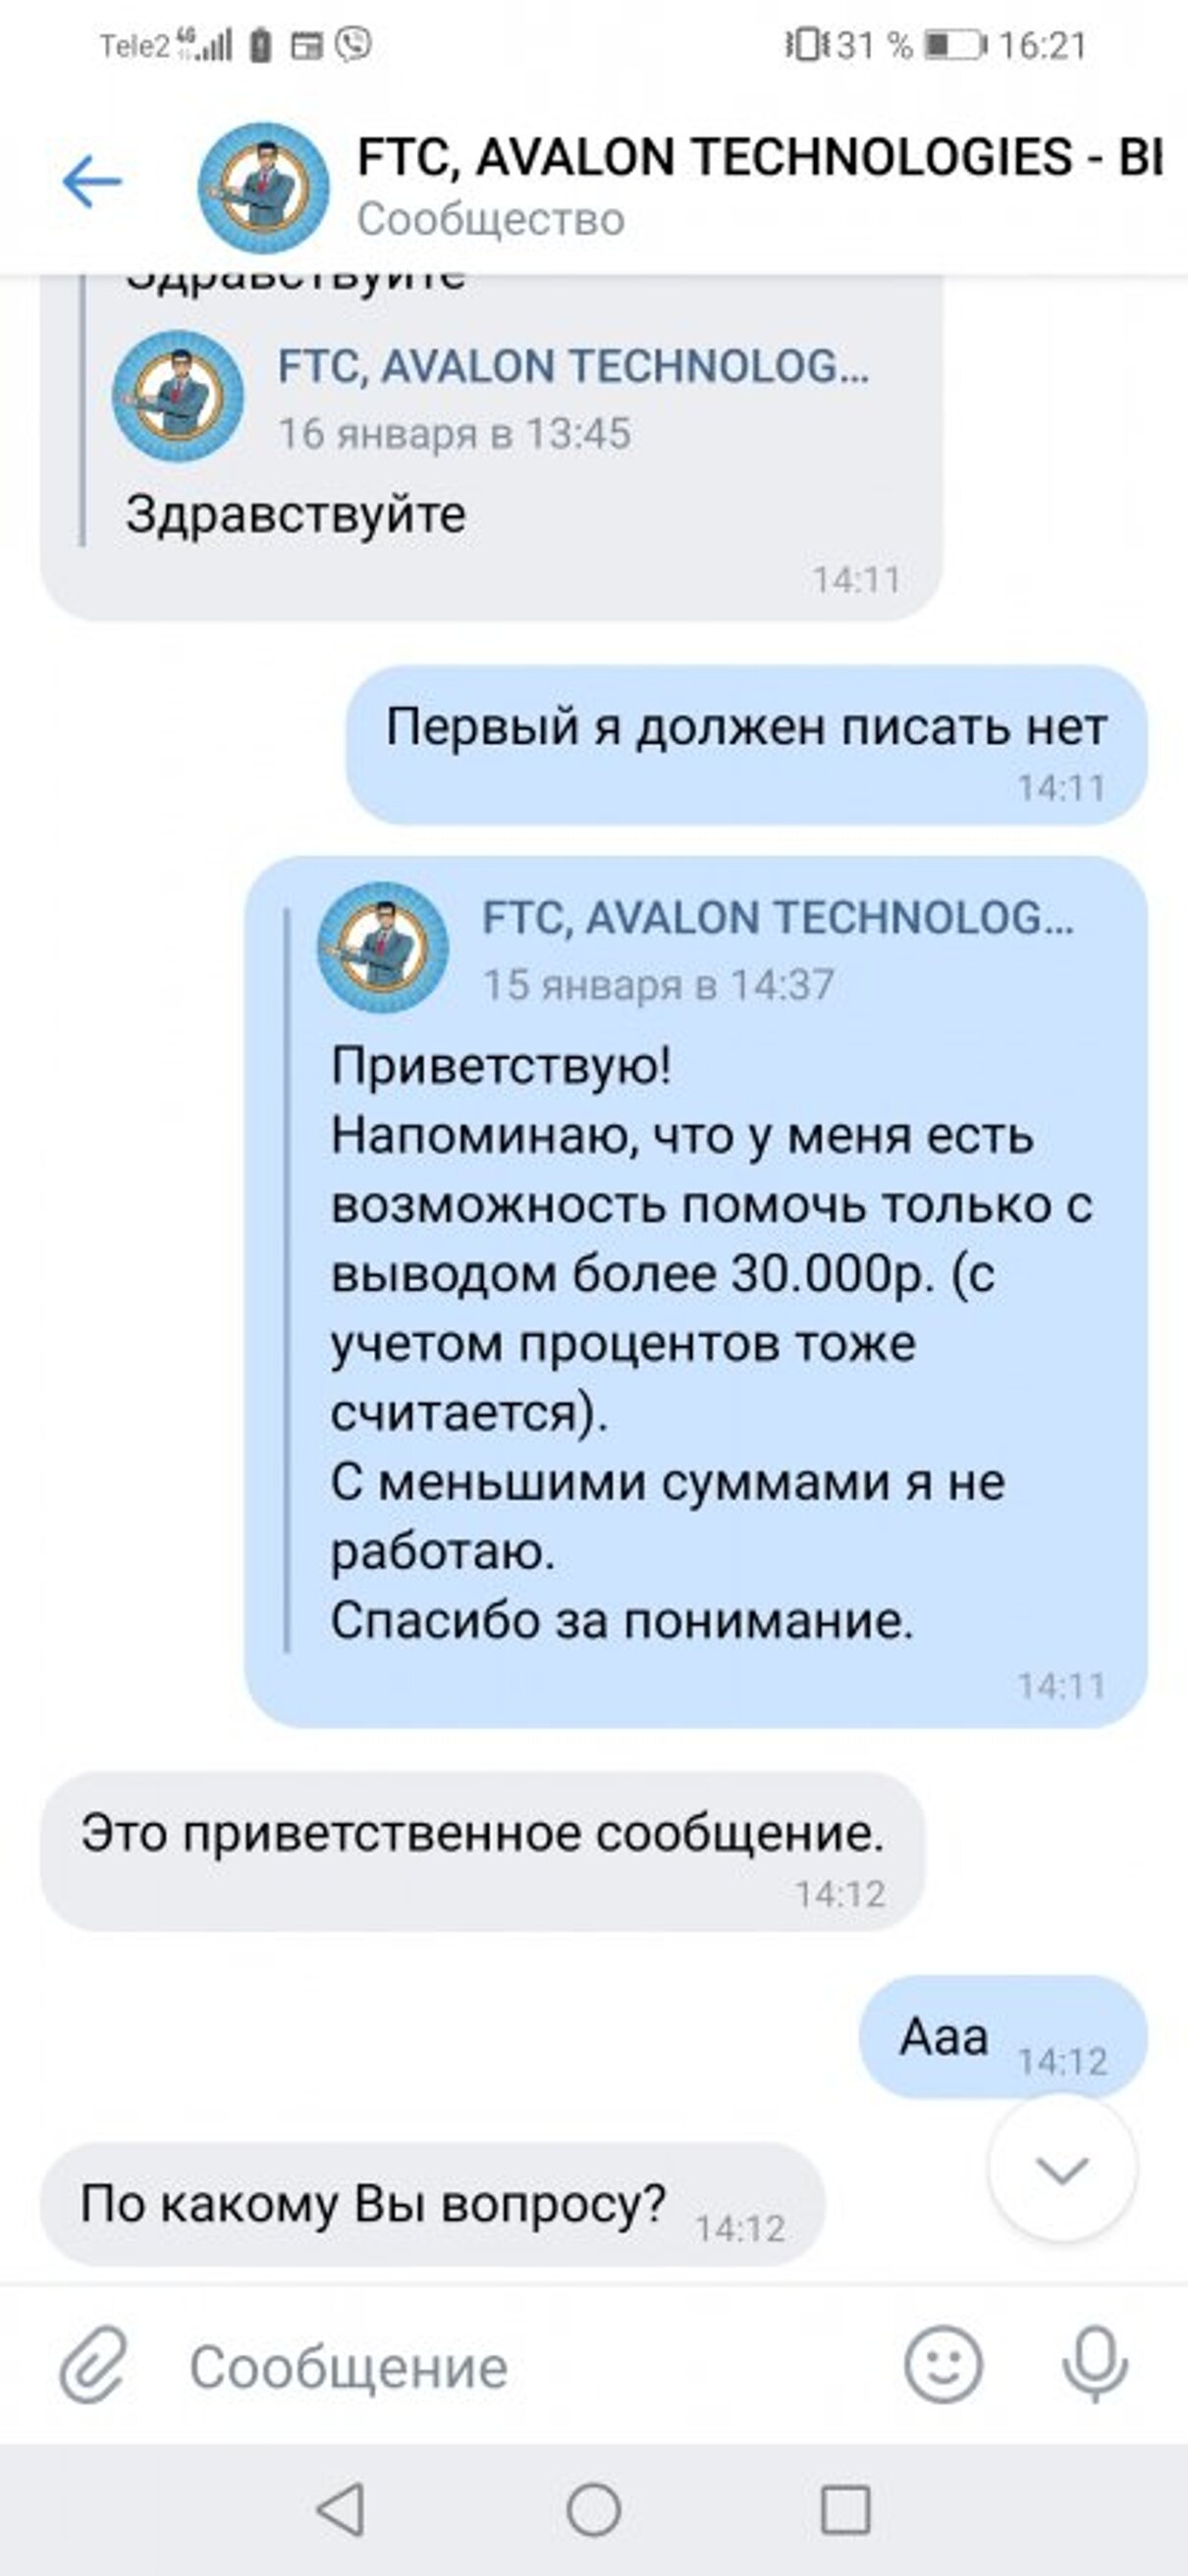 Жалоба-отзыв: FTC, Avalon Technologies - Мошенники.  Фото №5